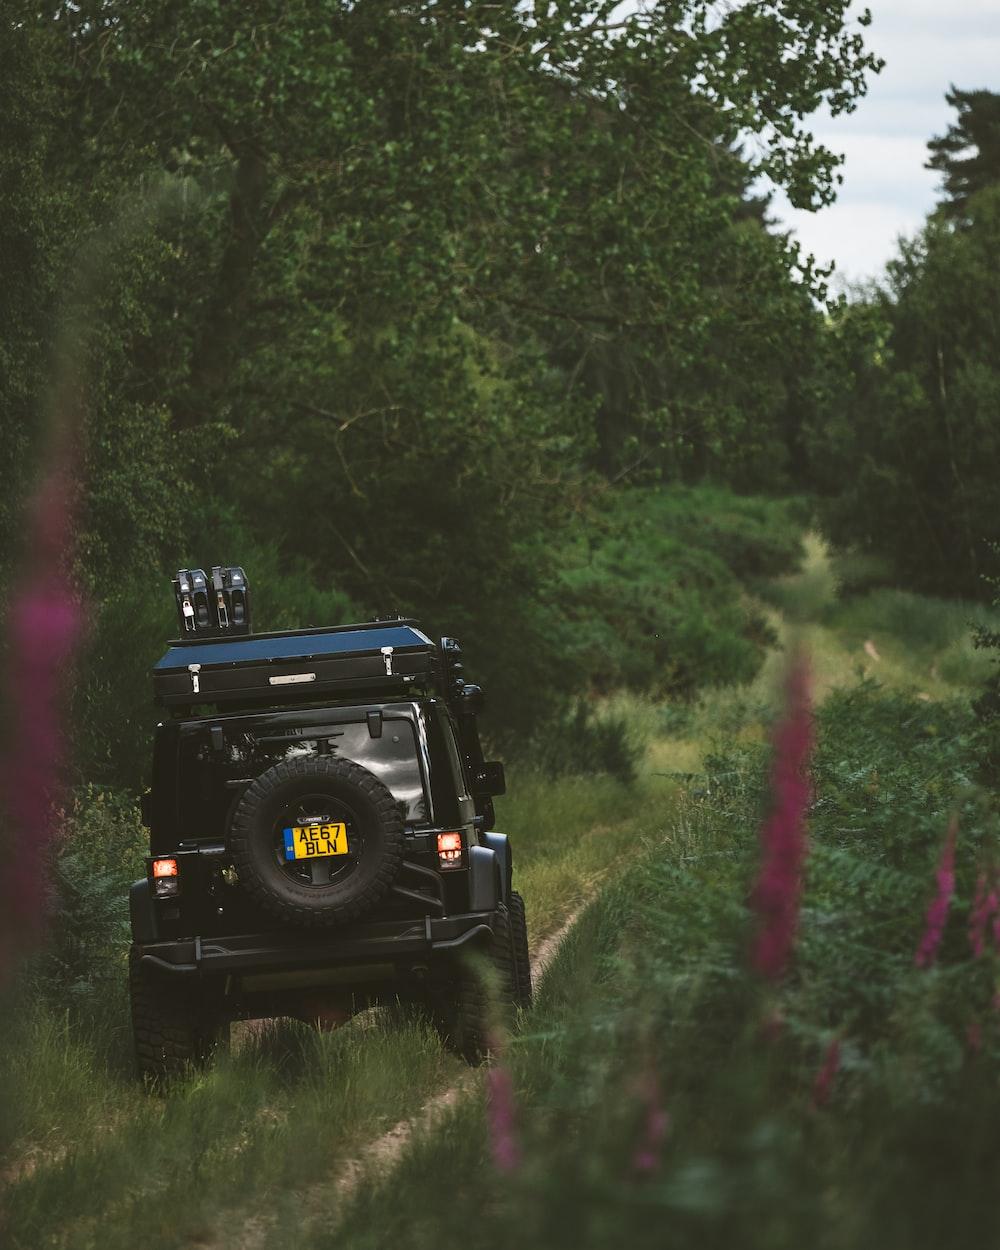 black 4x4 vehicle going through the jungle